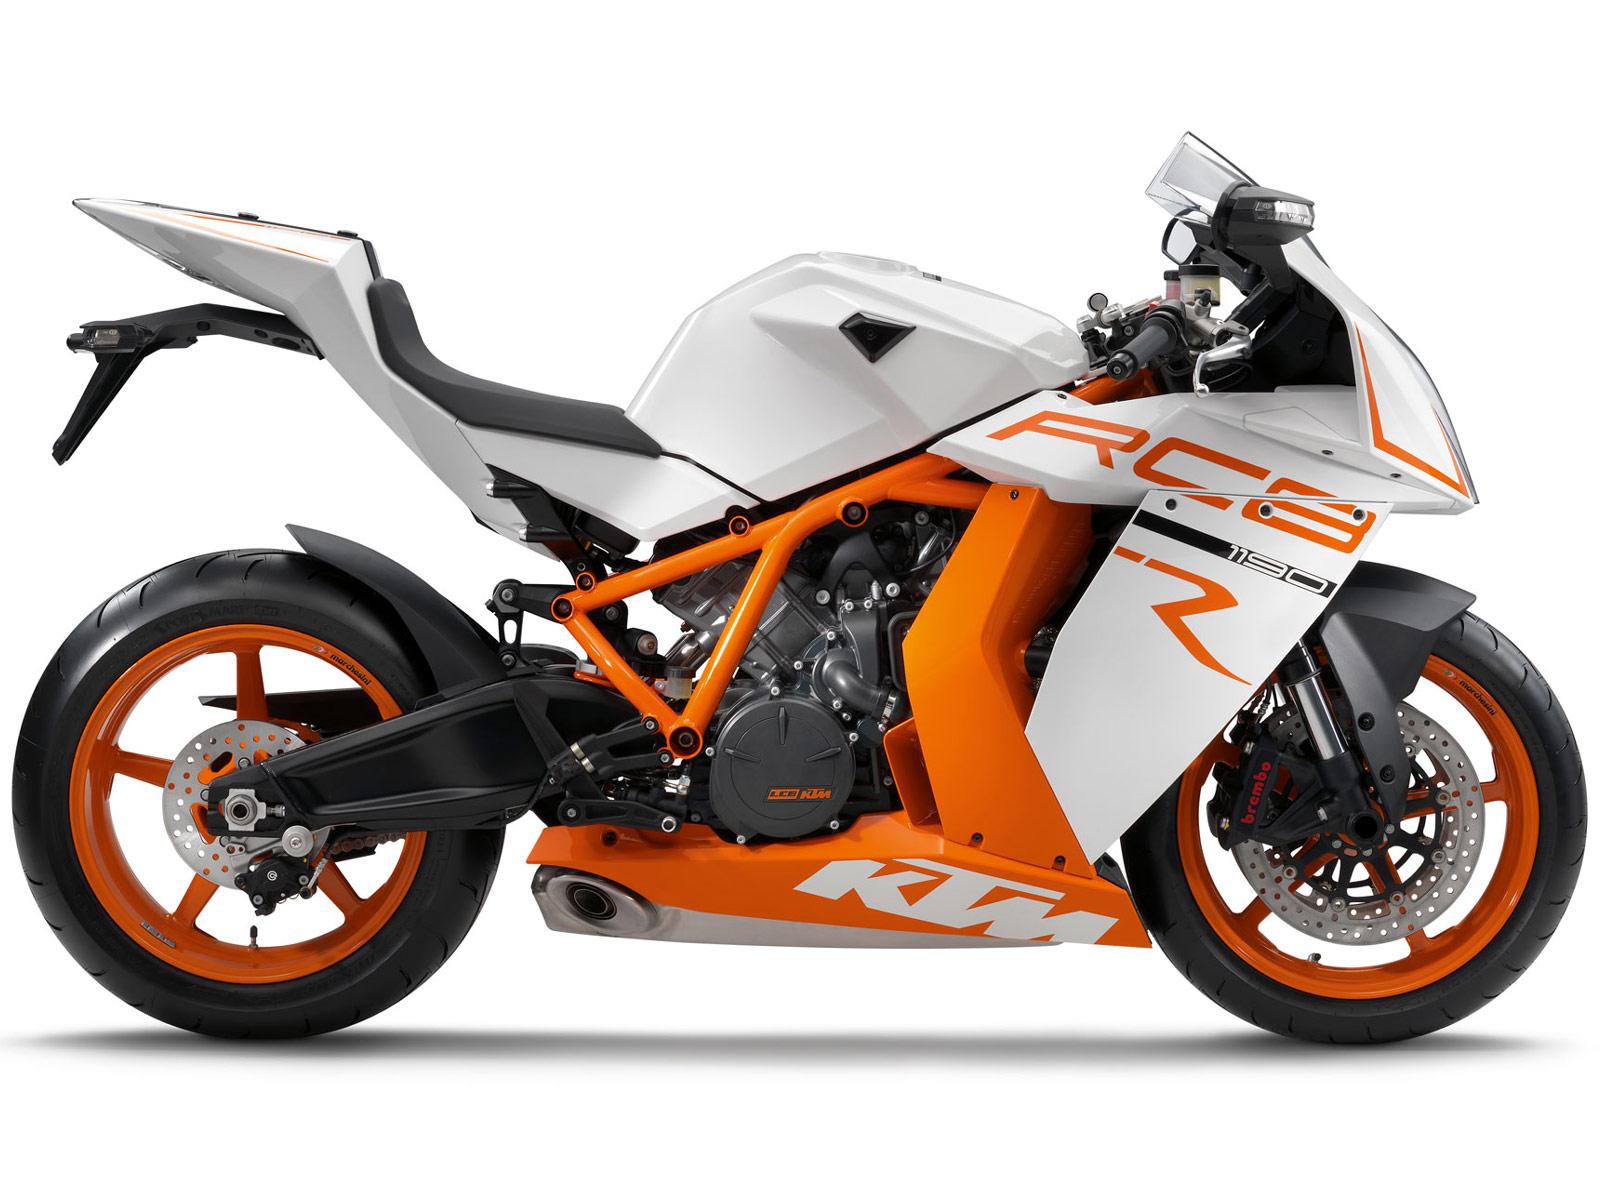 Bimota+motorcycle+3d+Wallpaper+7.jpg